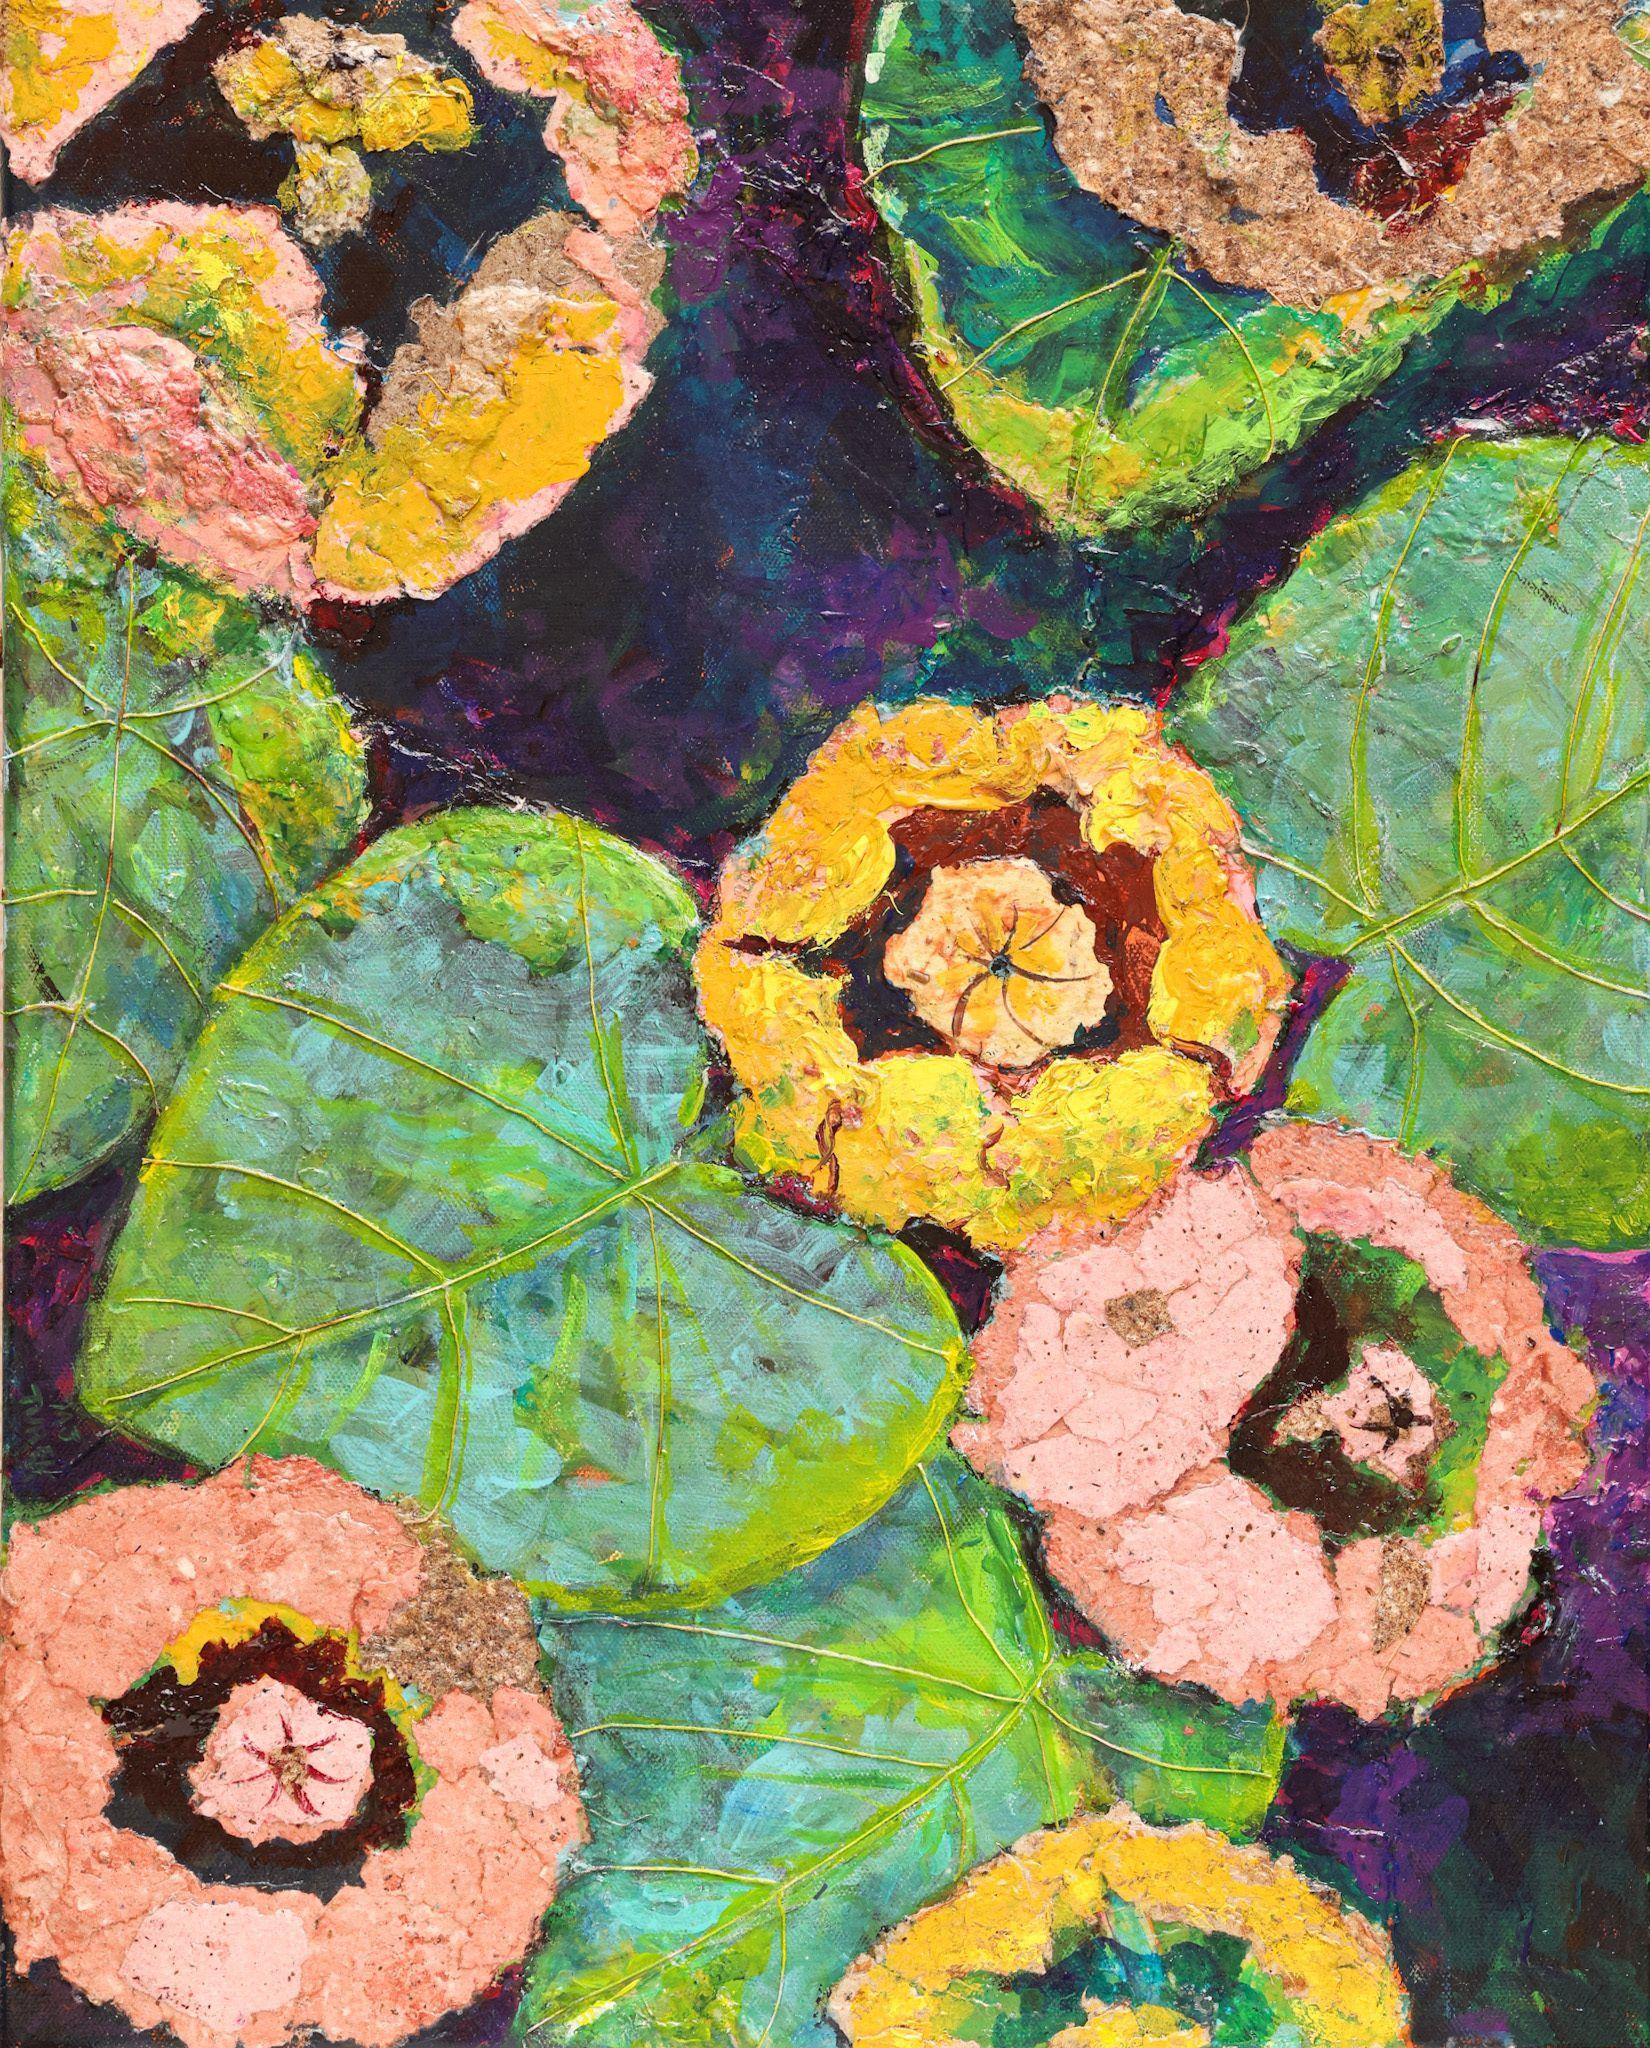 """Pond Lilies"" - MJ Turek"